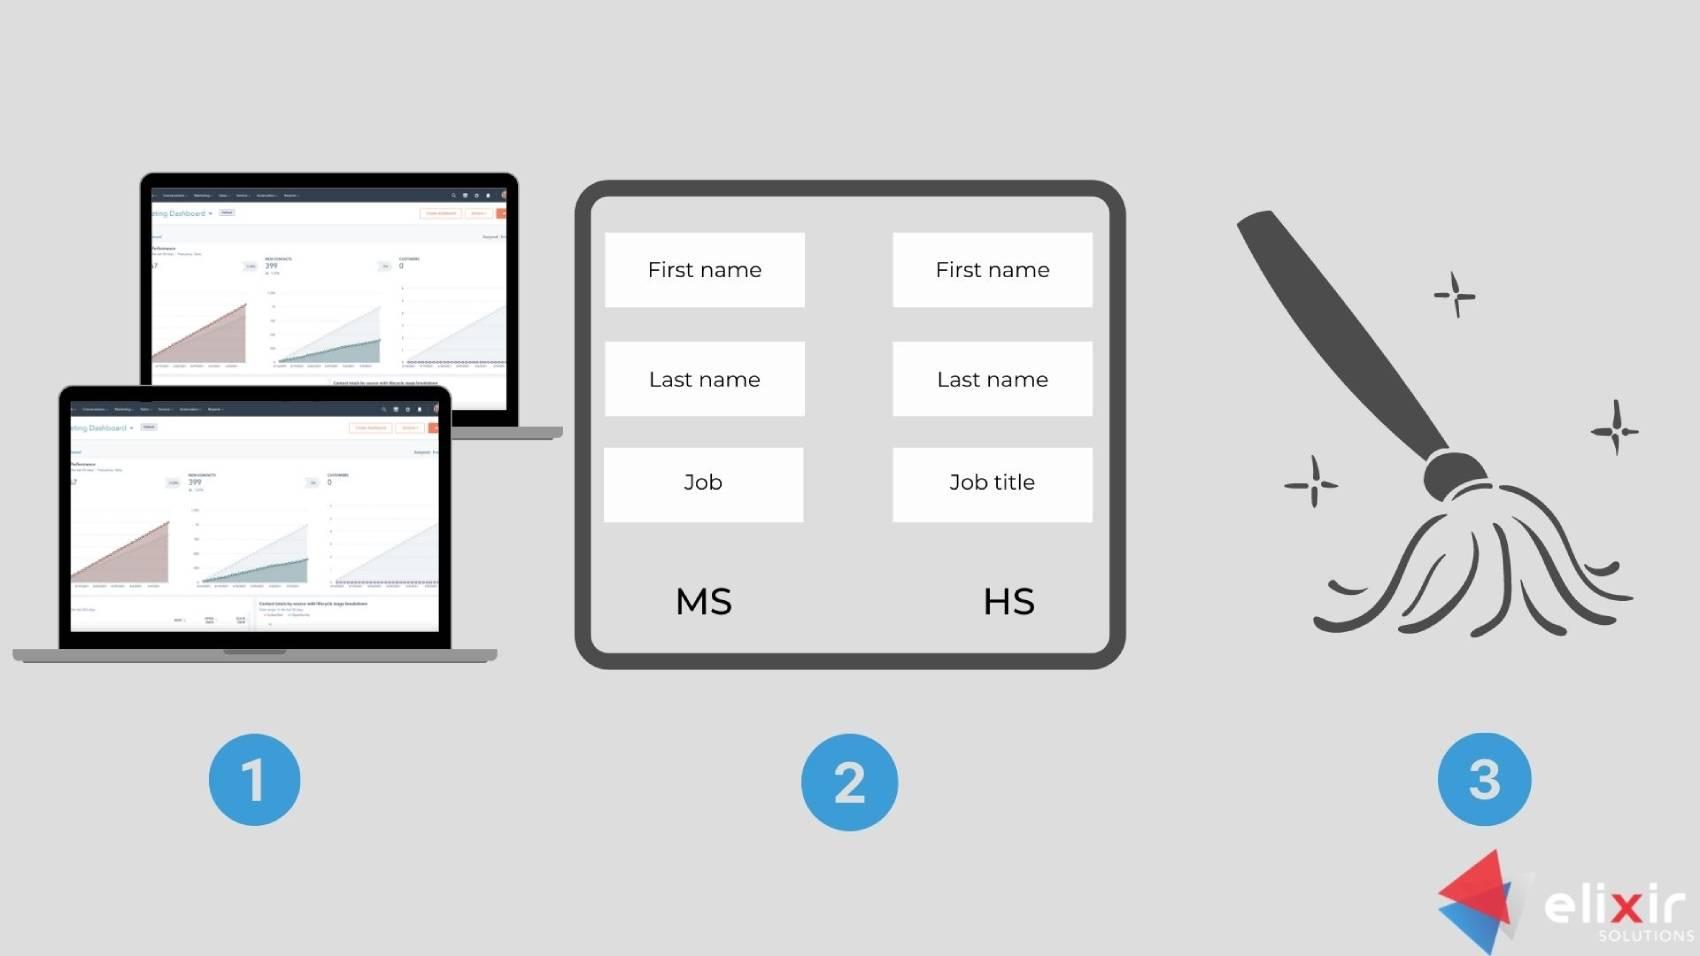 The steps of Microsoft Dynamics and HubSpot integration improvement set up